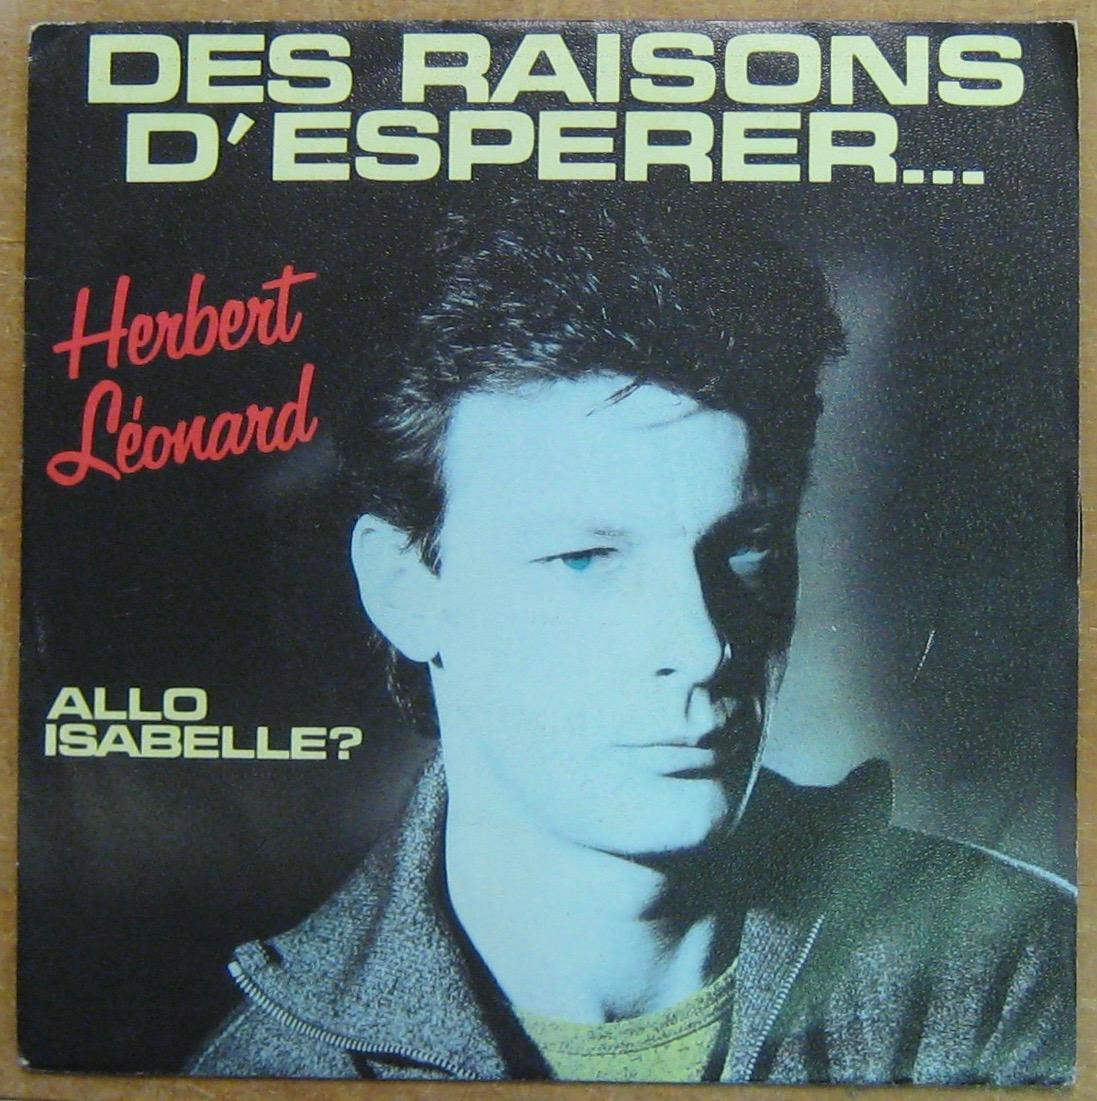 LÉONARD HERBERT - Des raisons d'espérer - 45T (SP 2 titres)